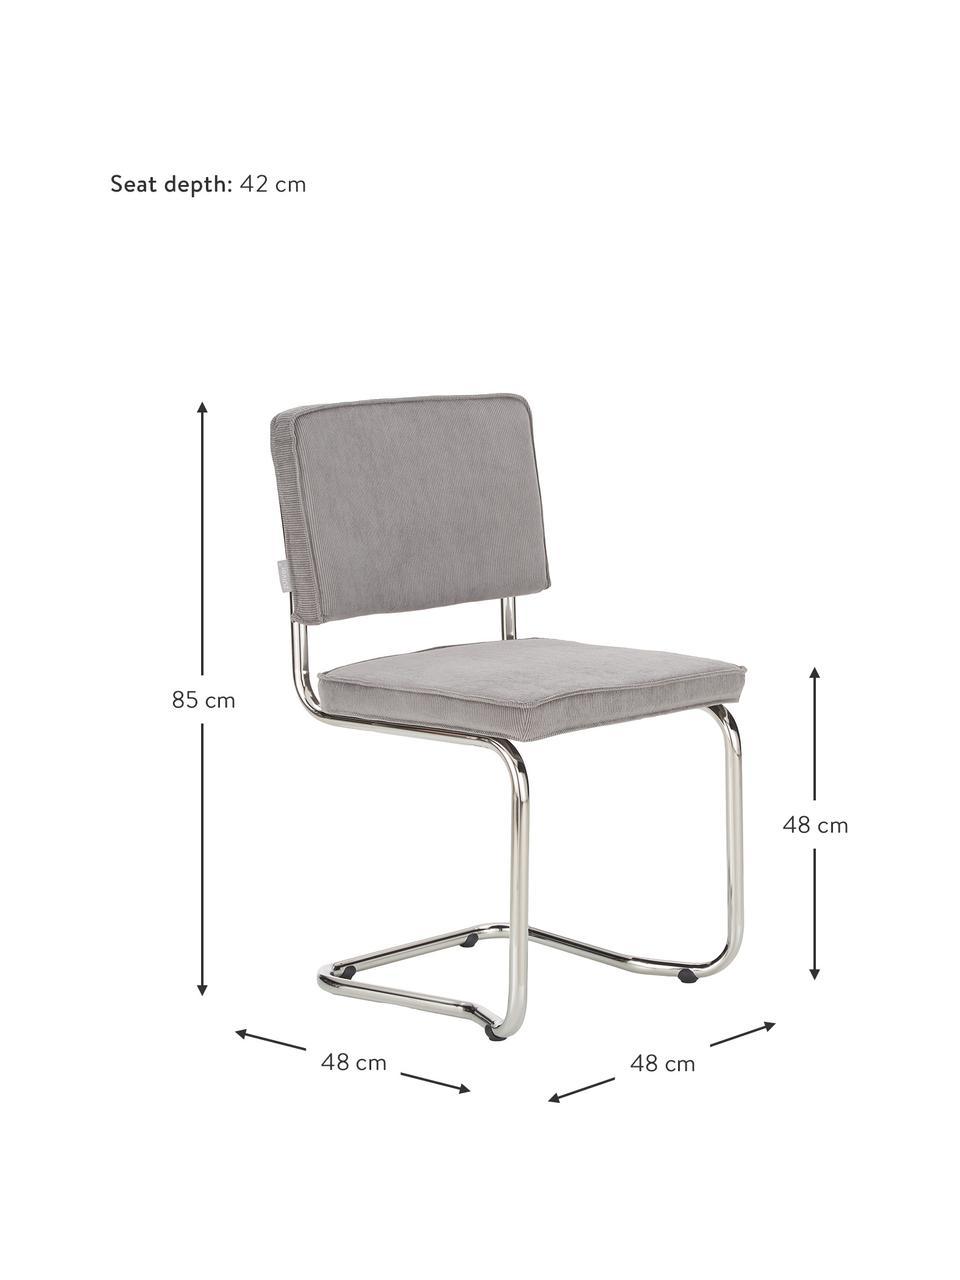 Silla cantilever de pana Kink, Tapizado: pana (88%nylon, 12%poli, Estructura: metal cromado, Pana gris clara, An 48 x F 48 cm